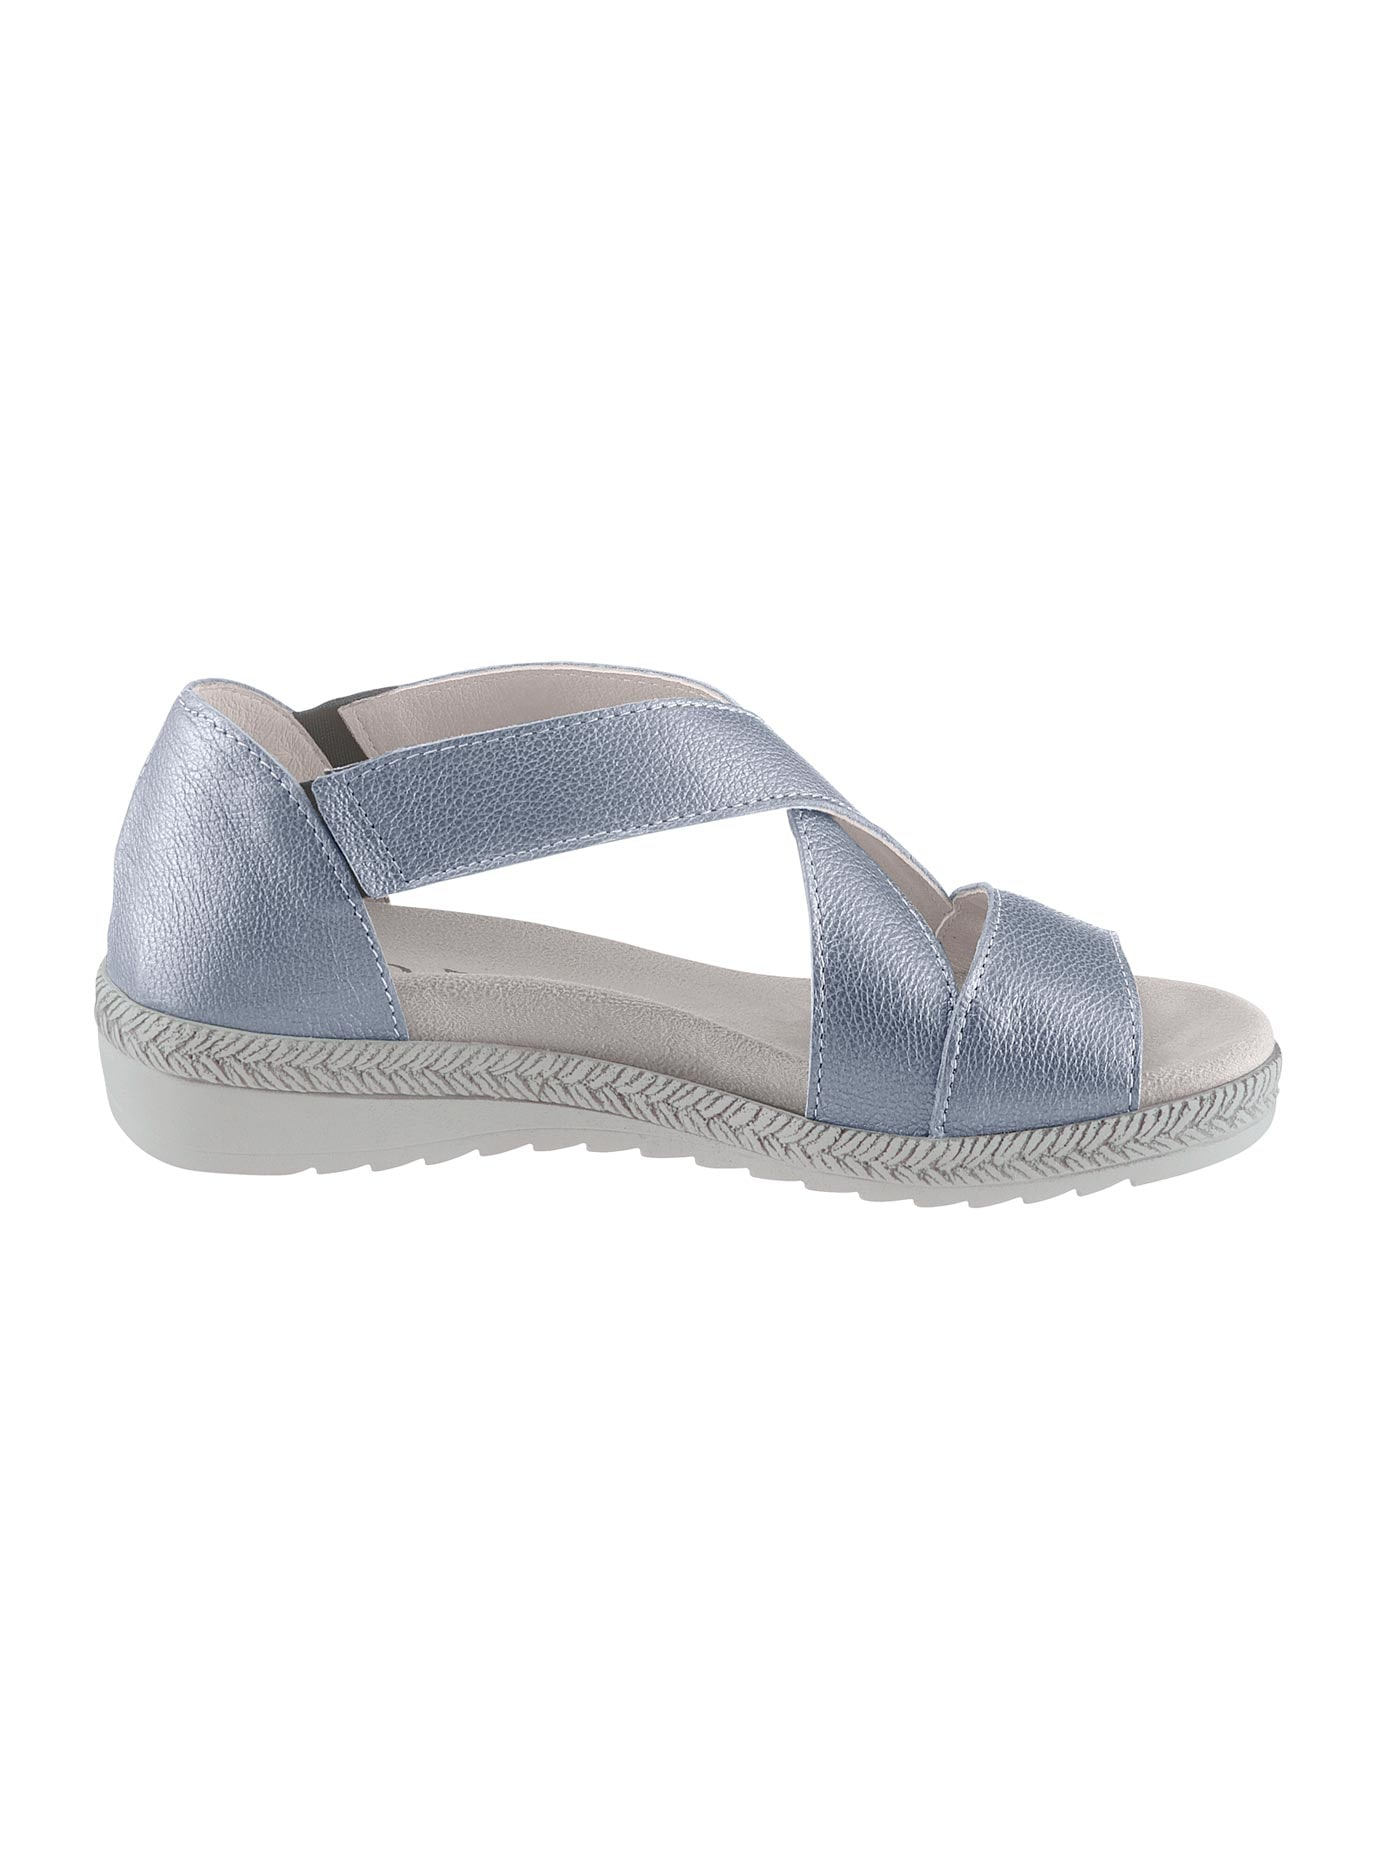 Aco Sandalette blau Damen Sandaletten Sandalen